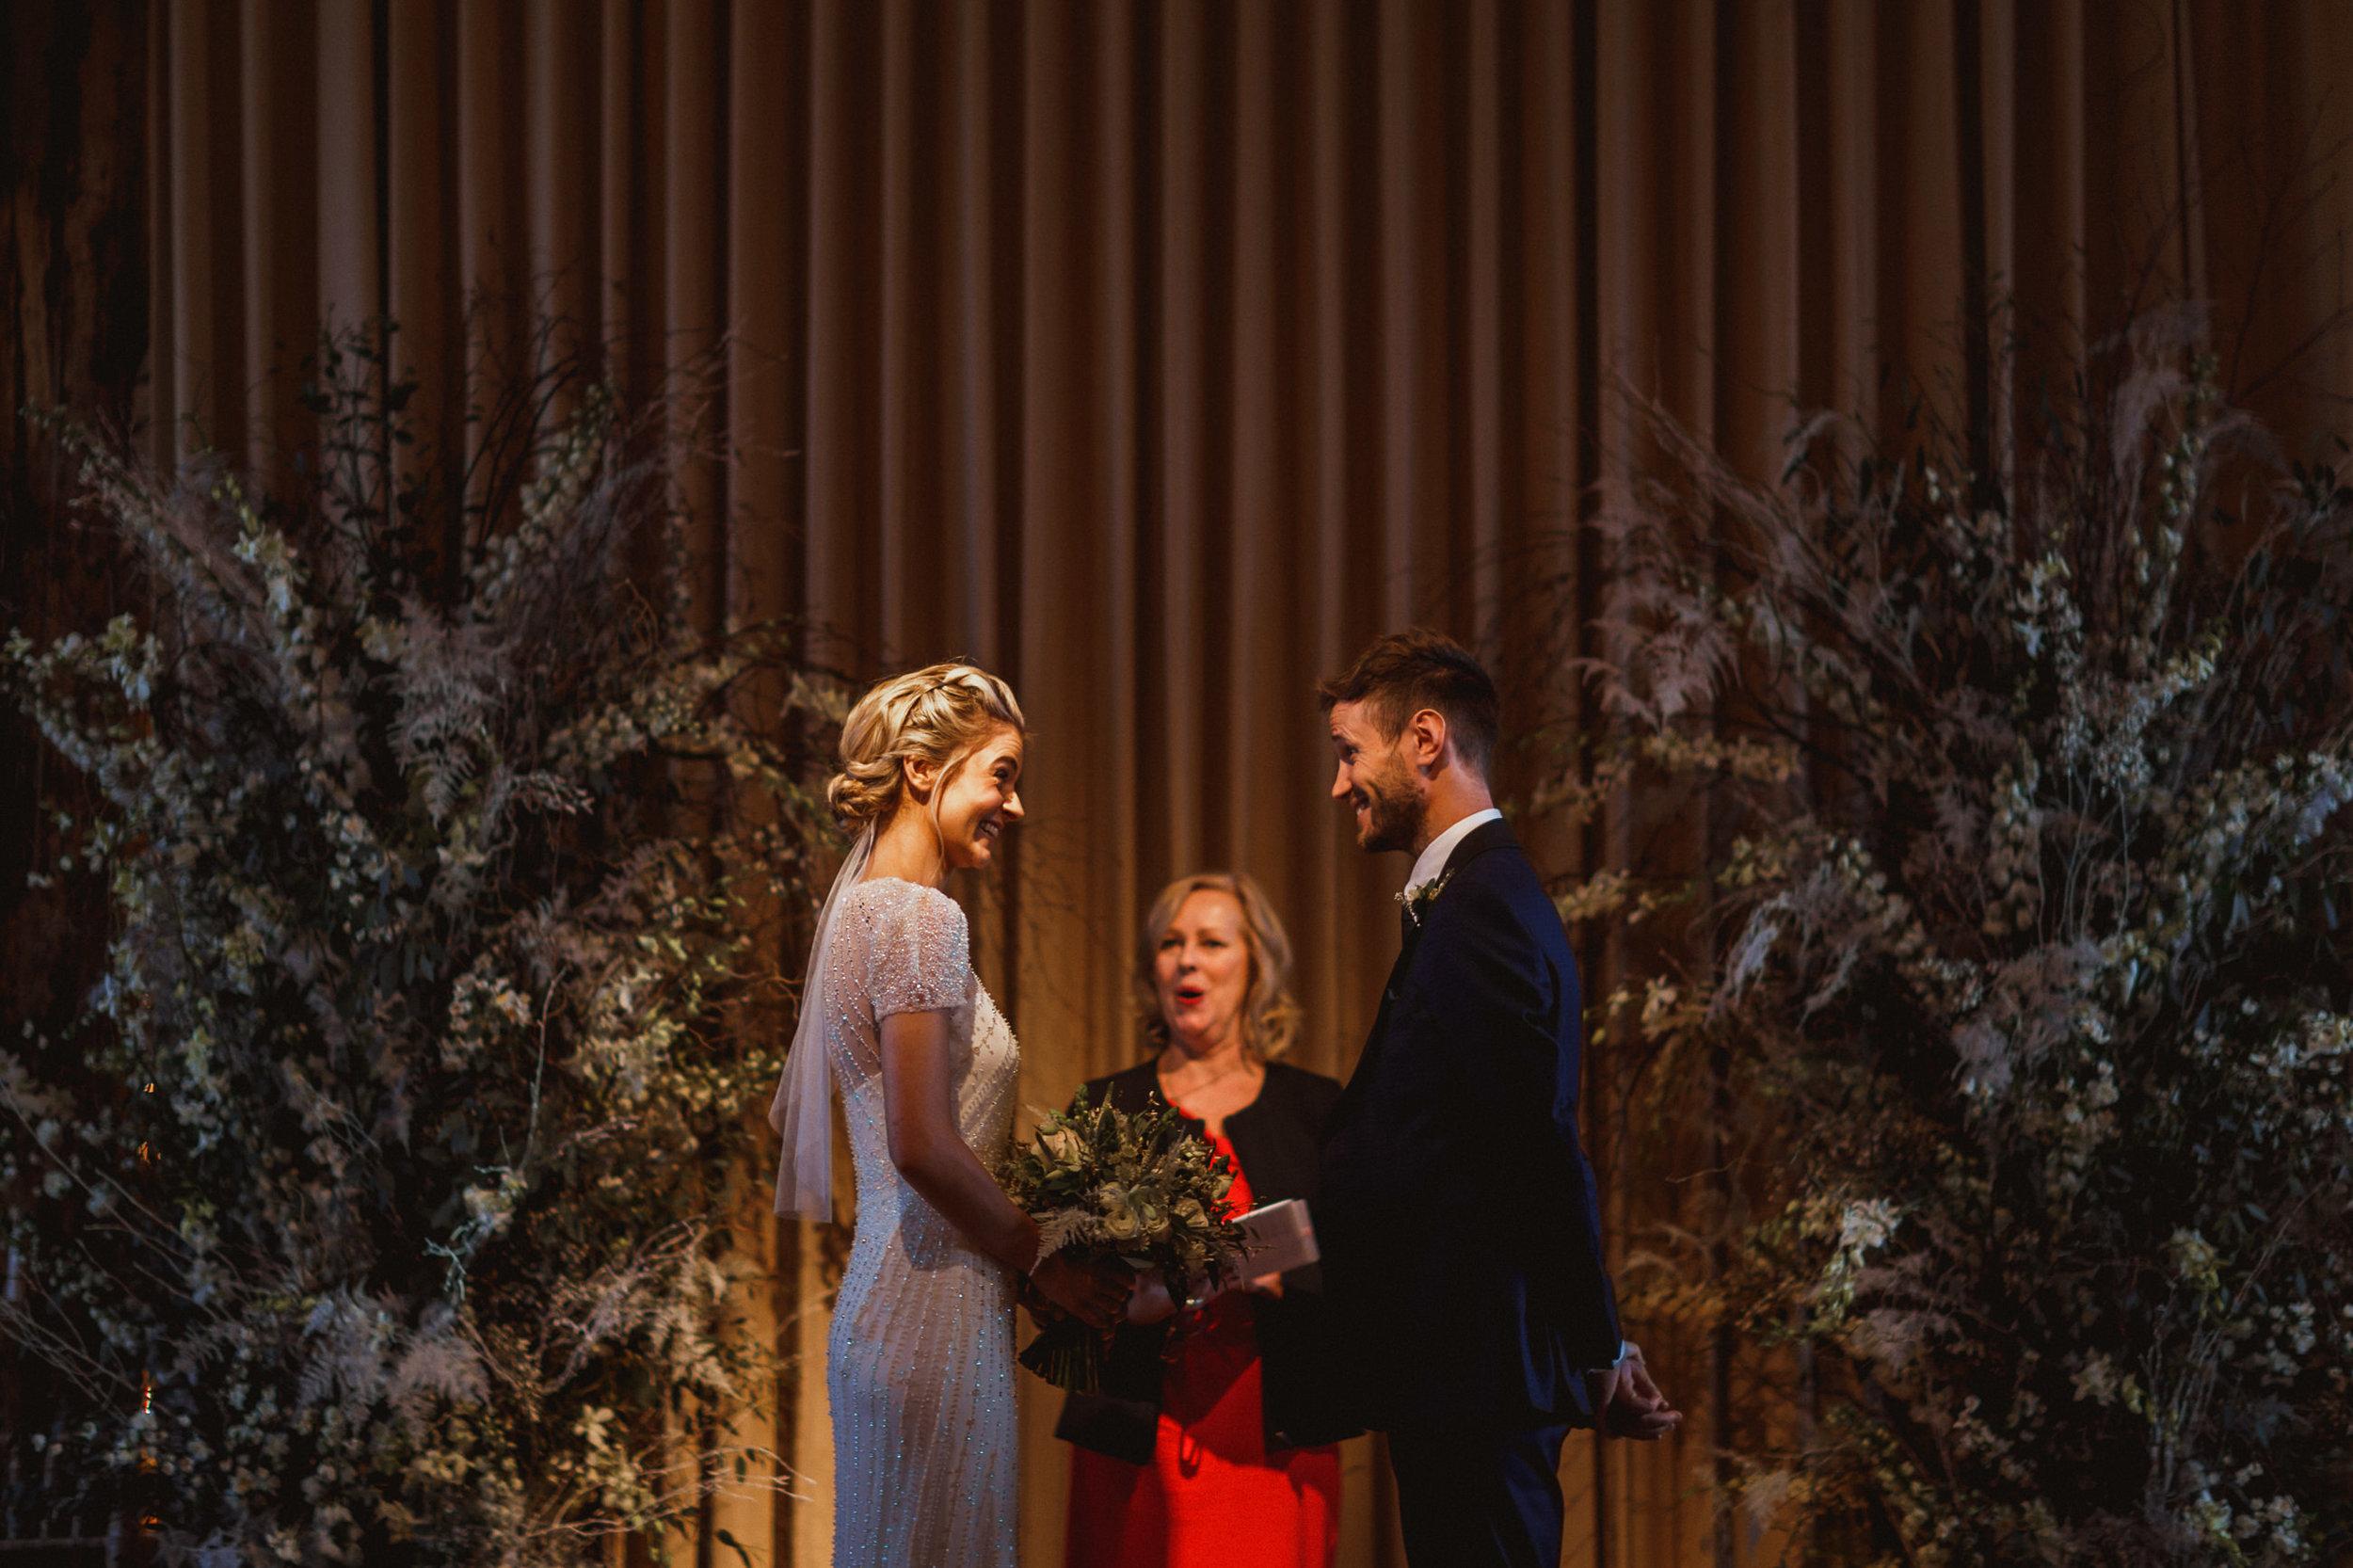 London_wedding_photographer_gione_da_silva_carelle_paul125.jpg